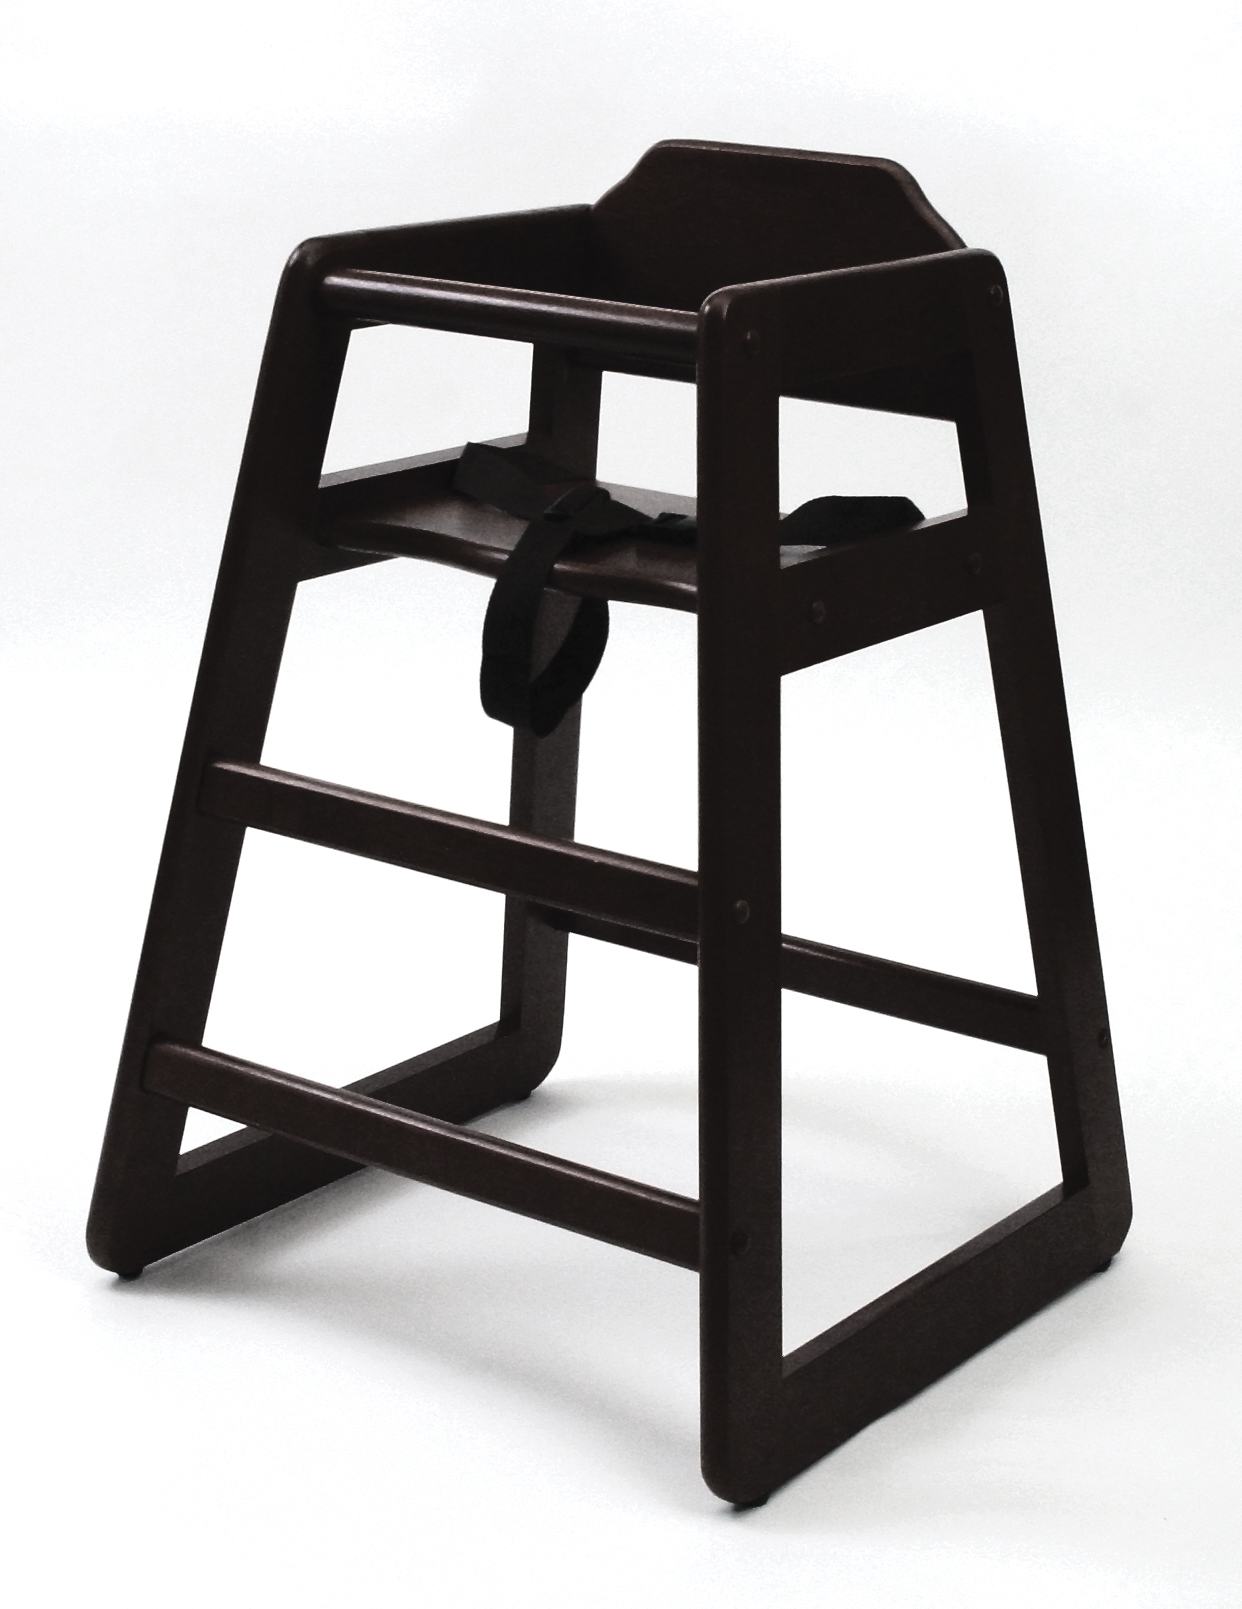 dining chair booster seat kmart office mat lipper international child 39s high espresso